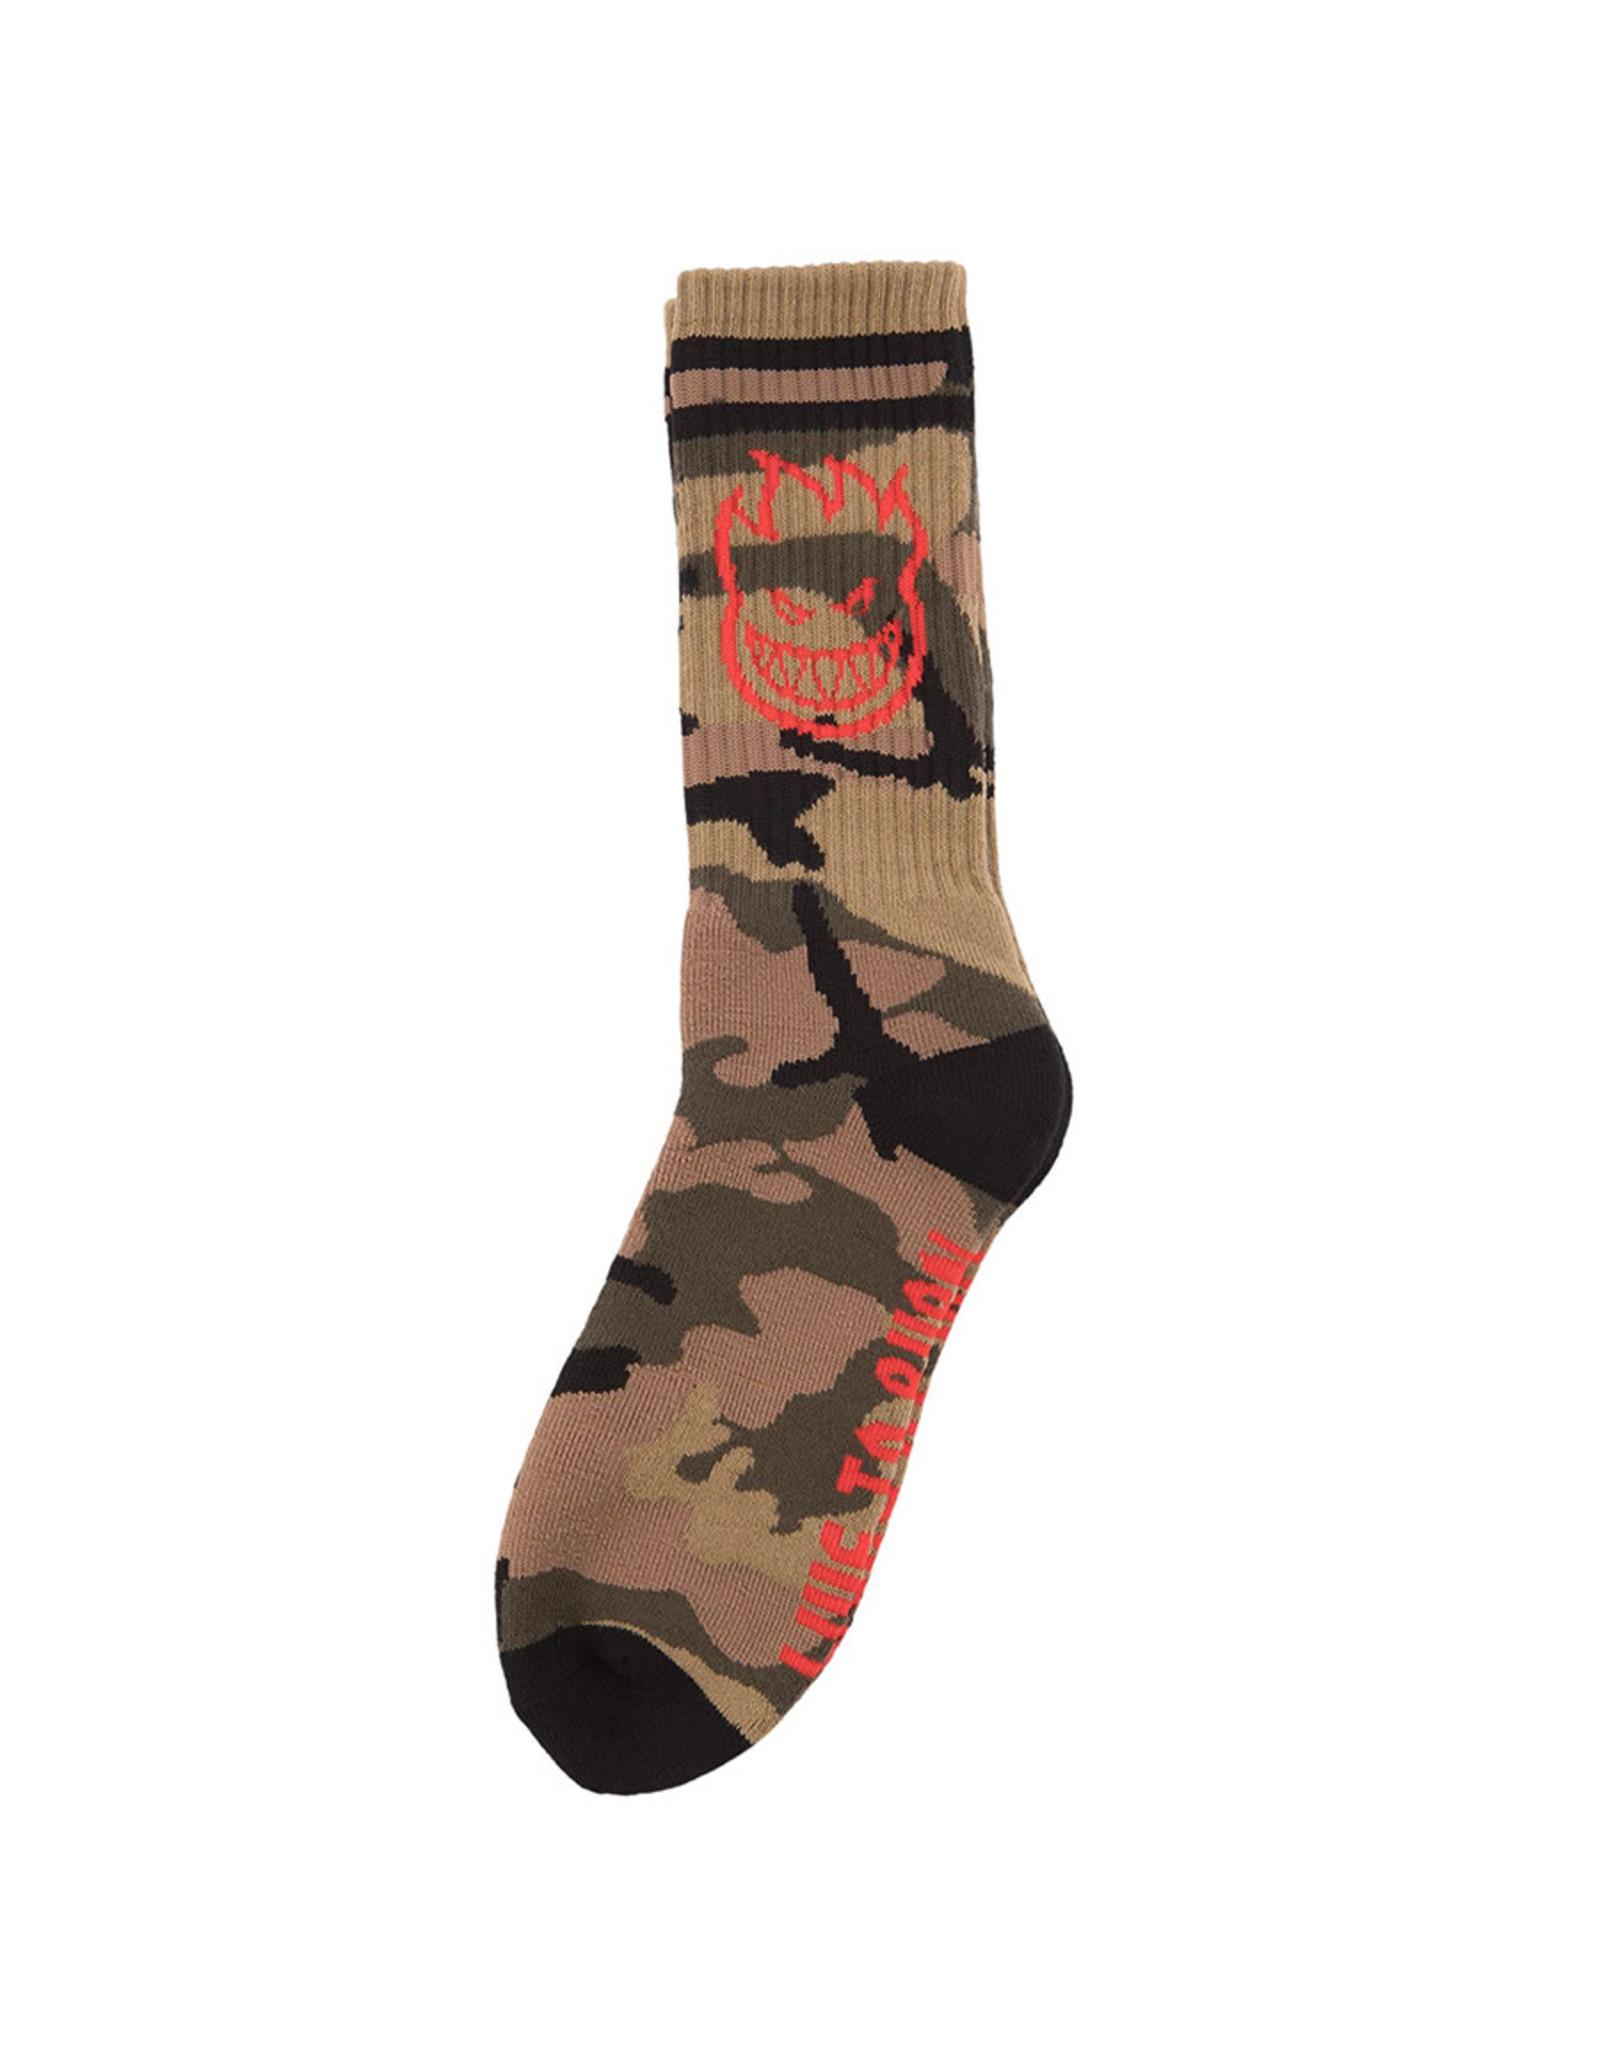 Spitfire Spitfire Socks Bighead Crew (Camo/Red/Black)